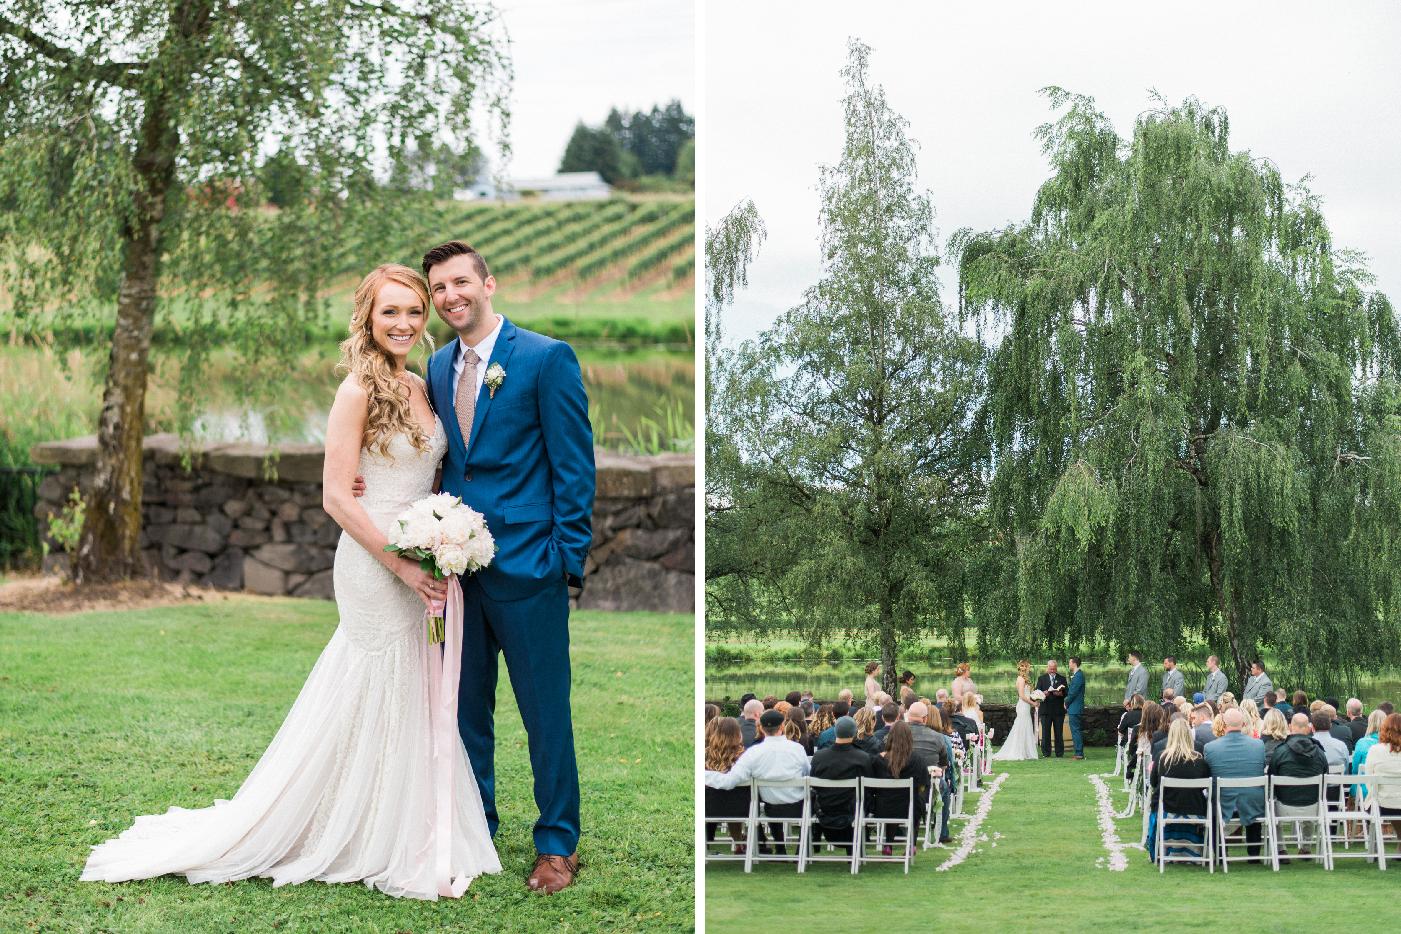 bethany-vineyard-wedding-portland-oregon-shelley-marie-photo-14.png